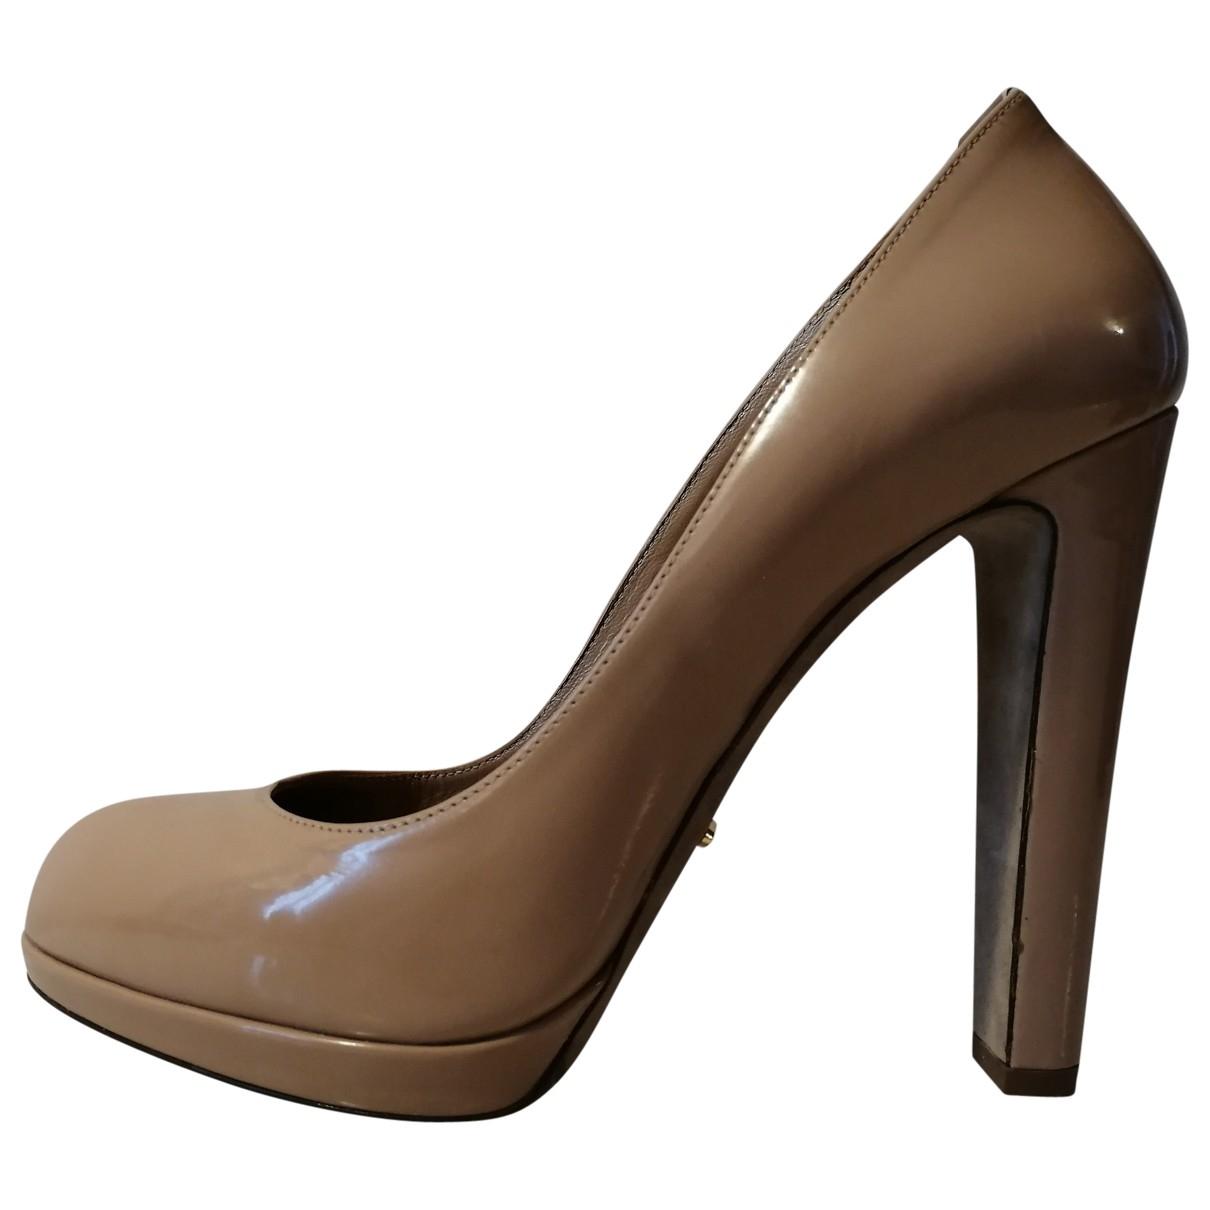 Sergio Rossi \N Beige Patent leather Heels for Women 38.5 EU